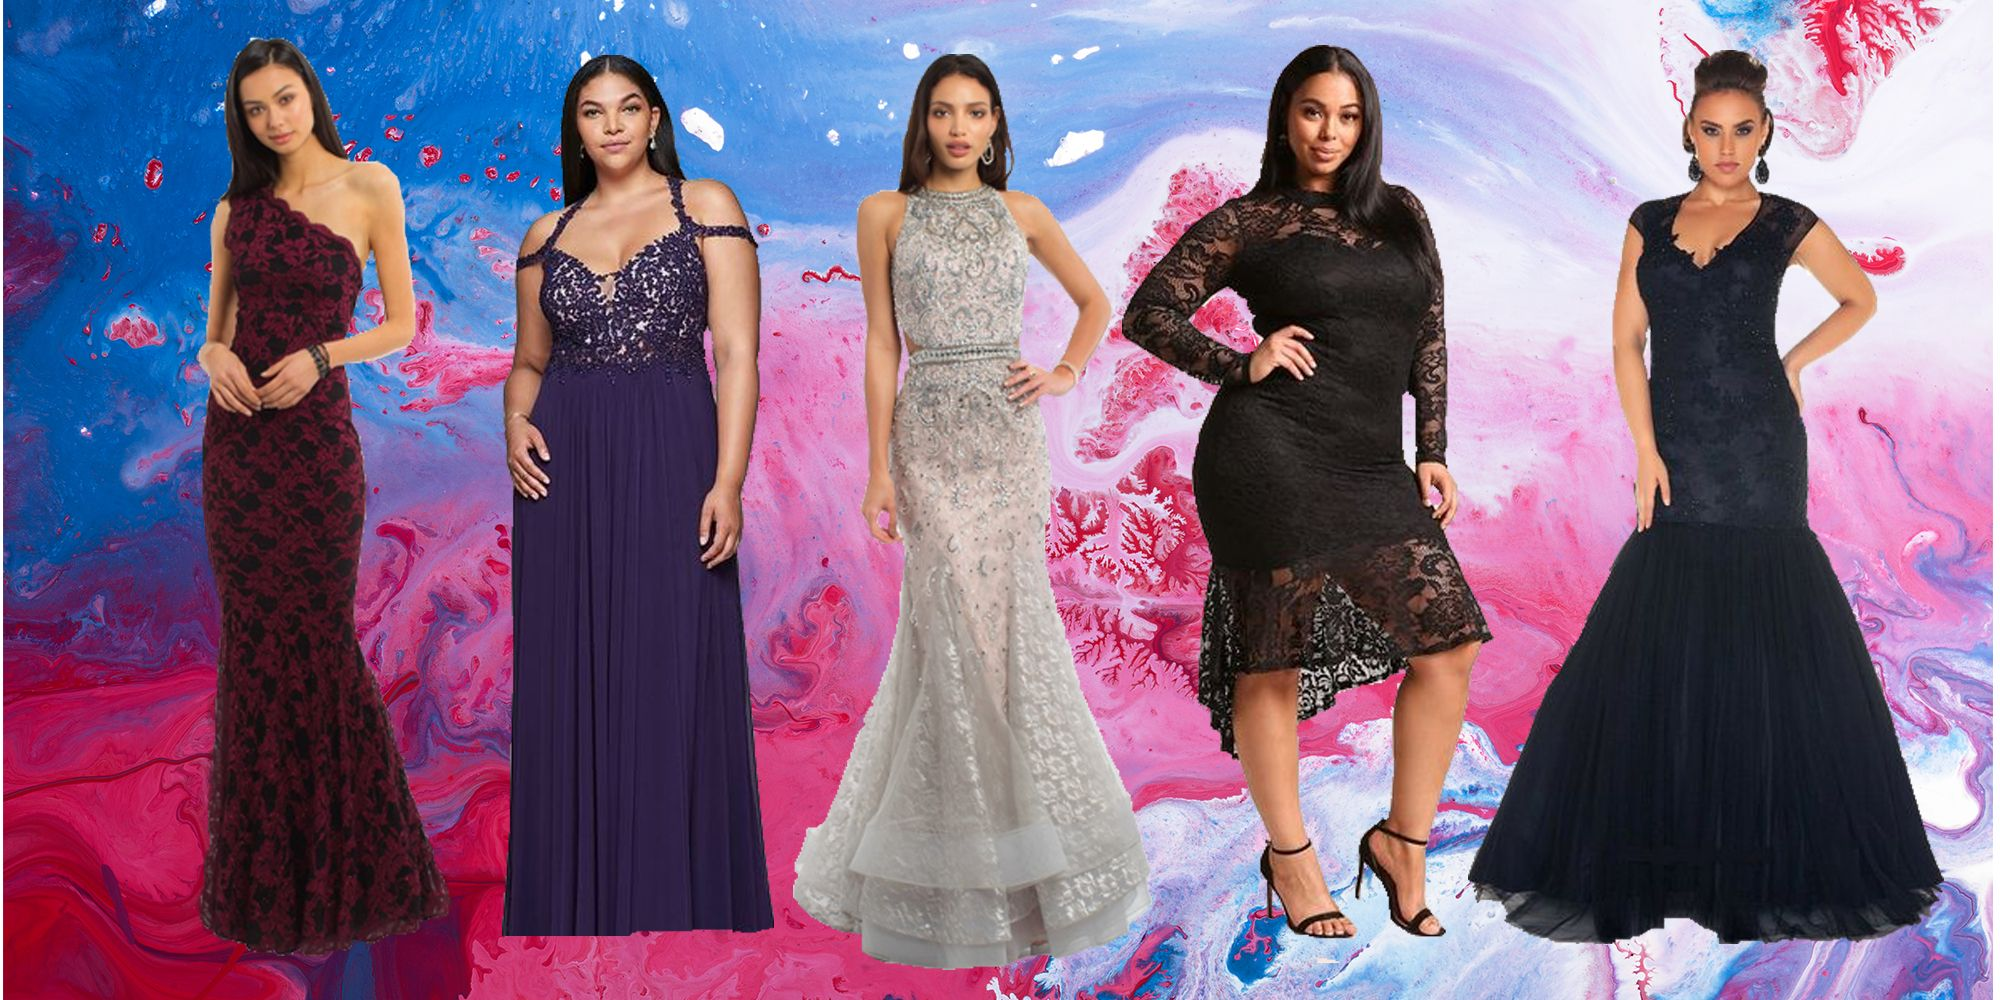 Harlem Night Theme for Prom Dresses